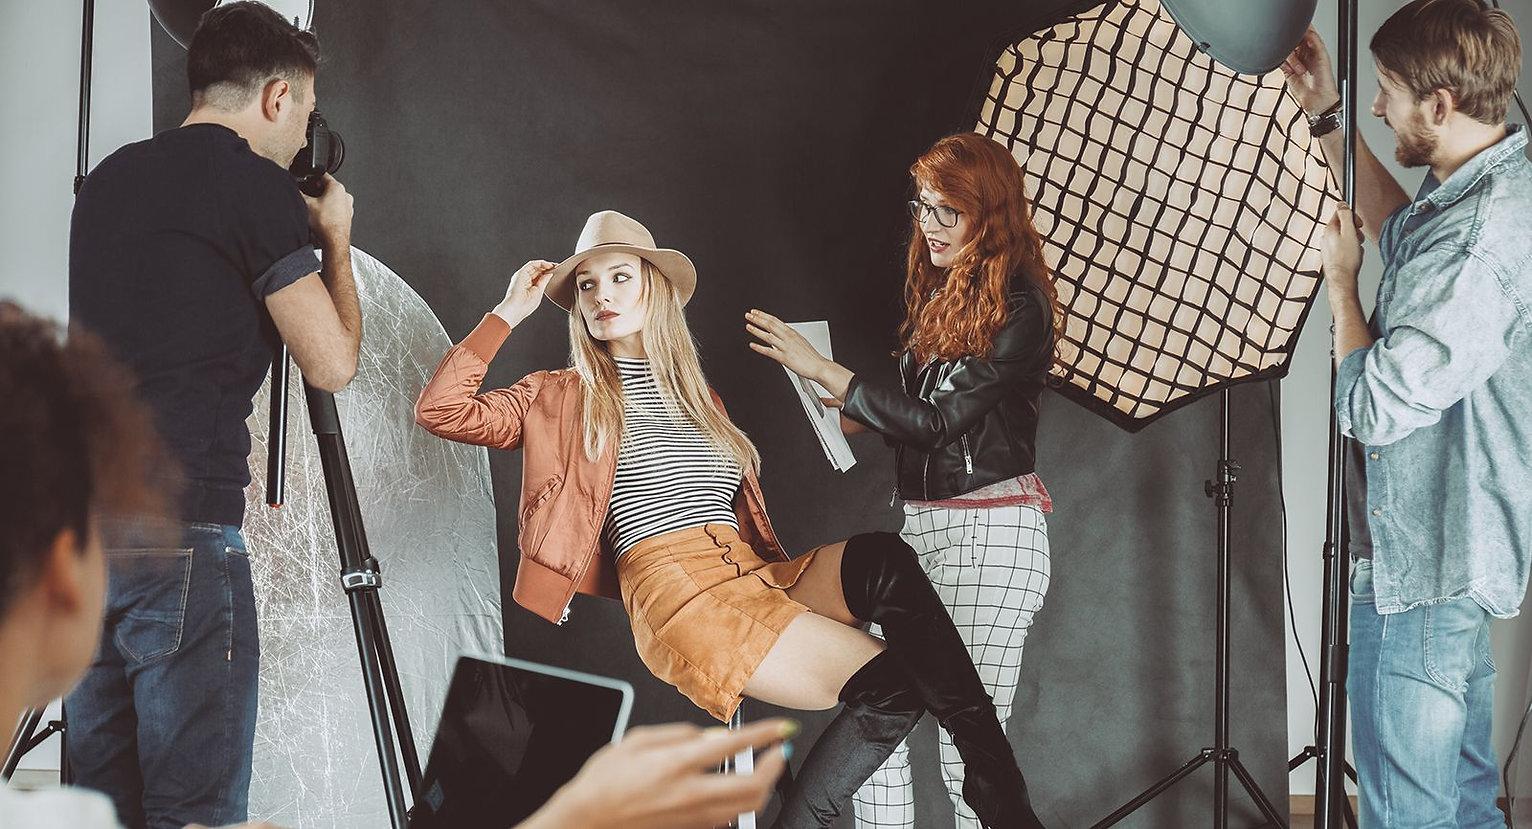 model-during-photoshoot.jpg